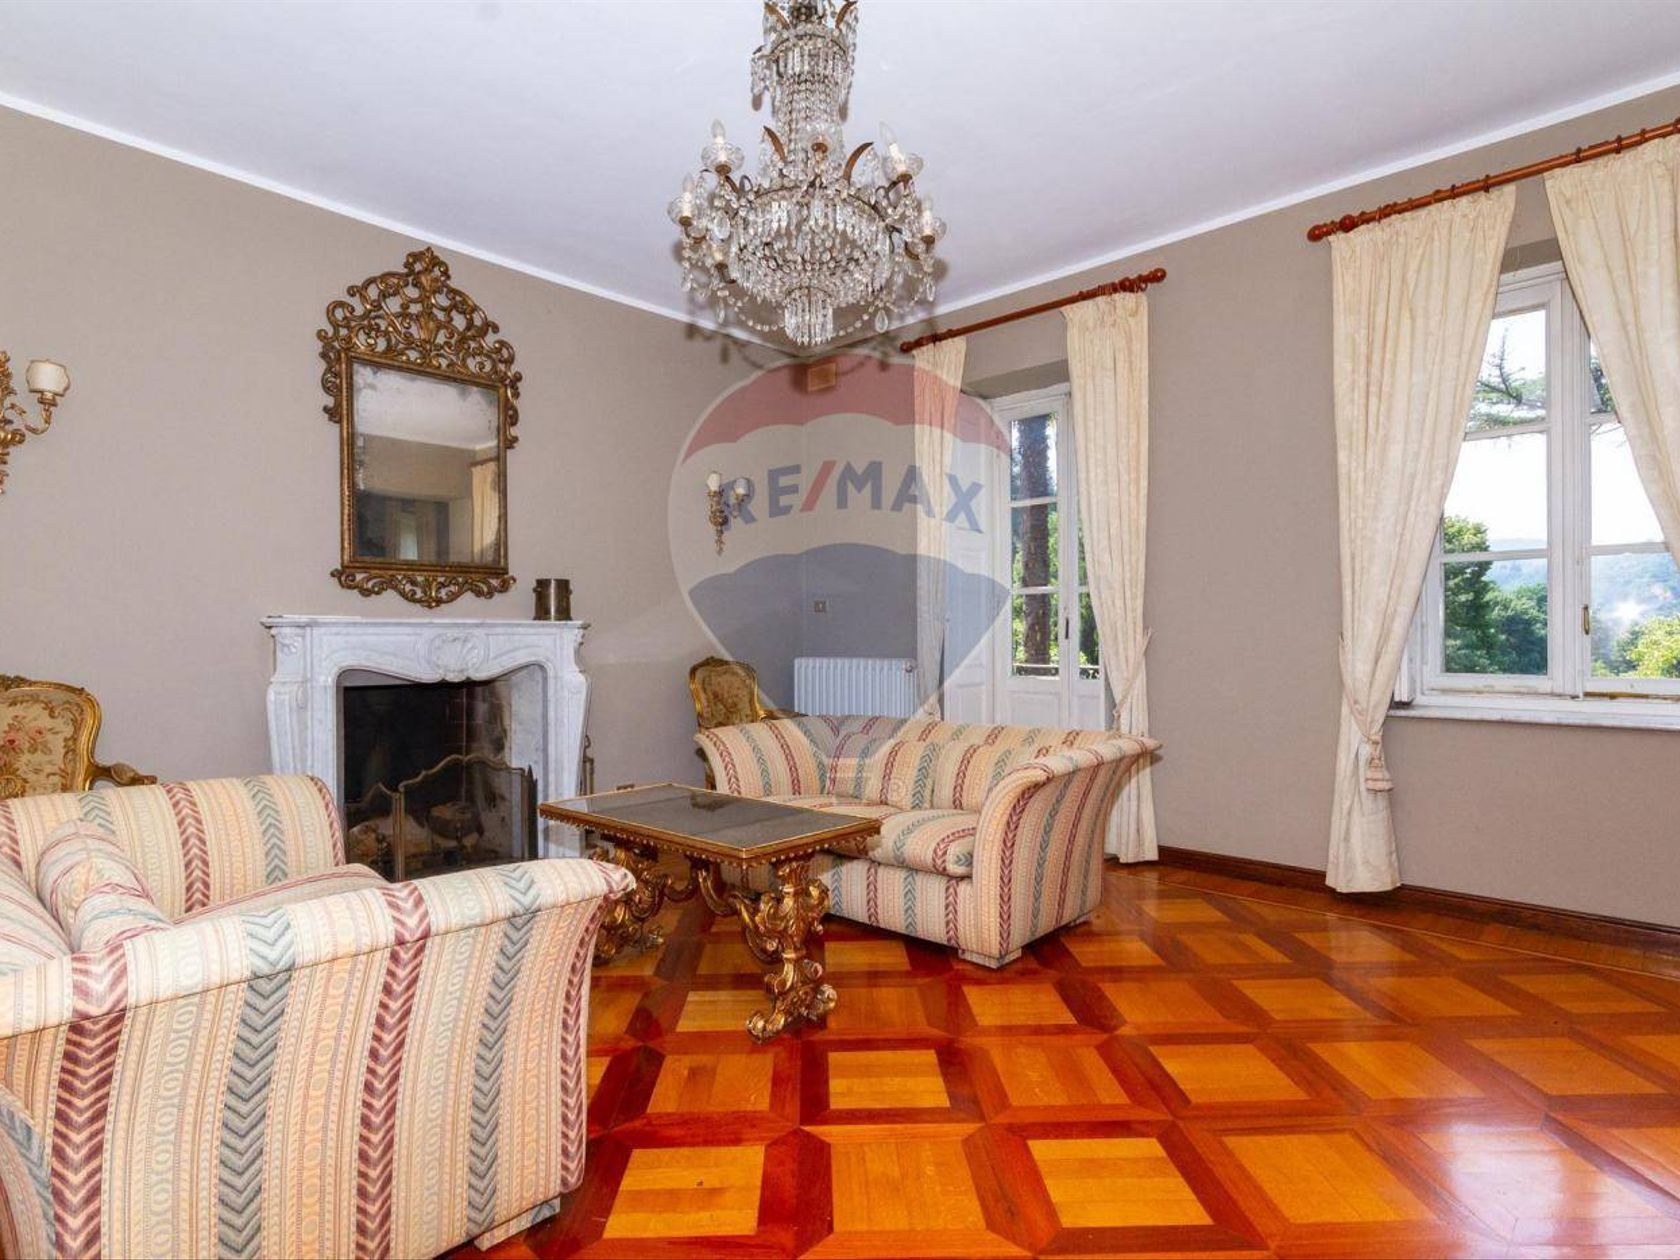 Casa Indipendente Torino-precollina Collina, Torino, TO Vendita - Foto 38